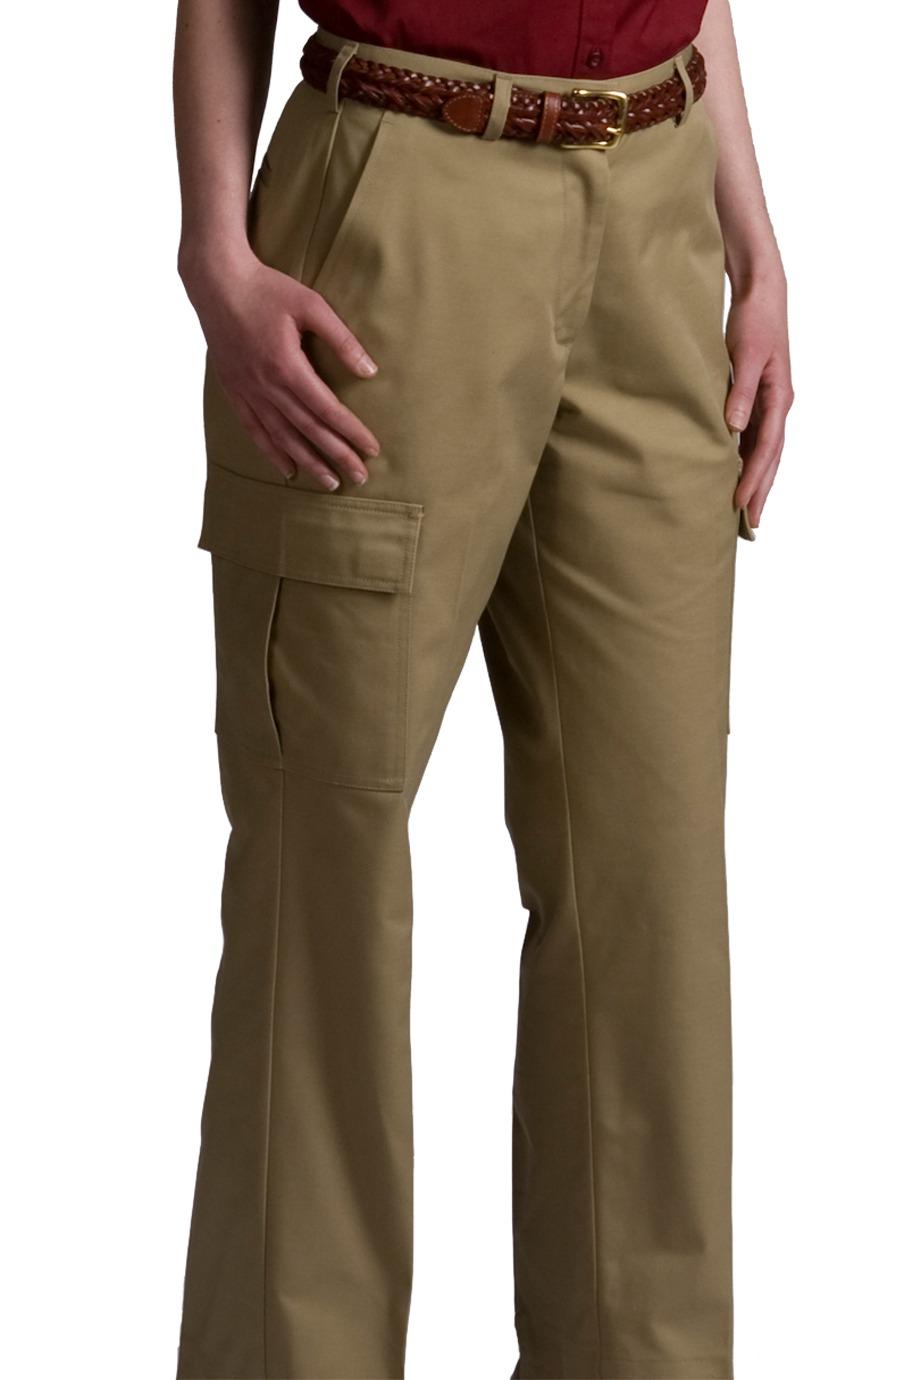 Edwards Garment 8568 - Women's Utility Cargo Pant